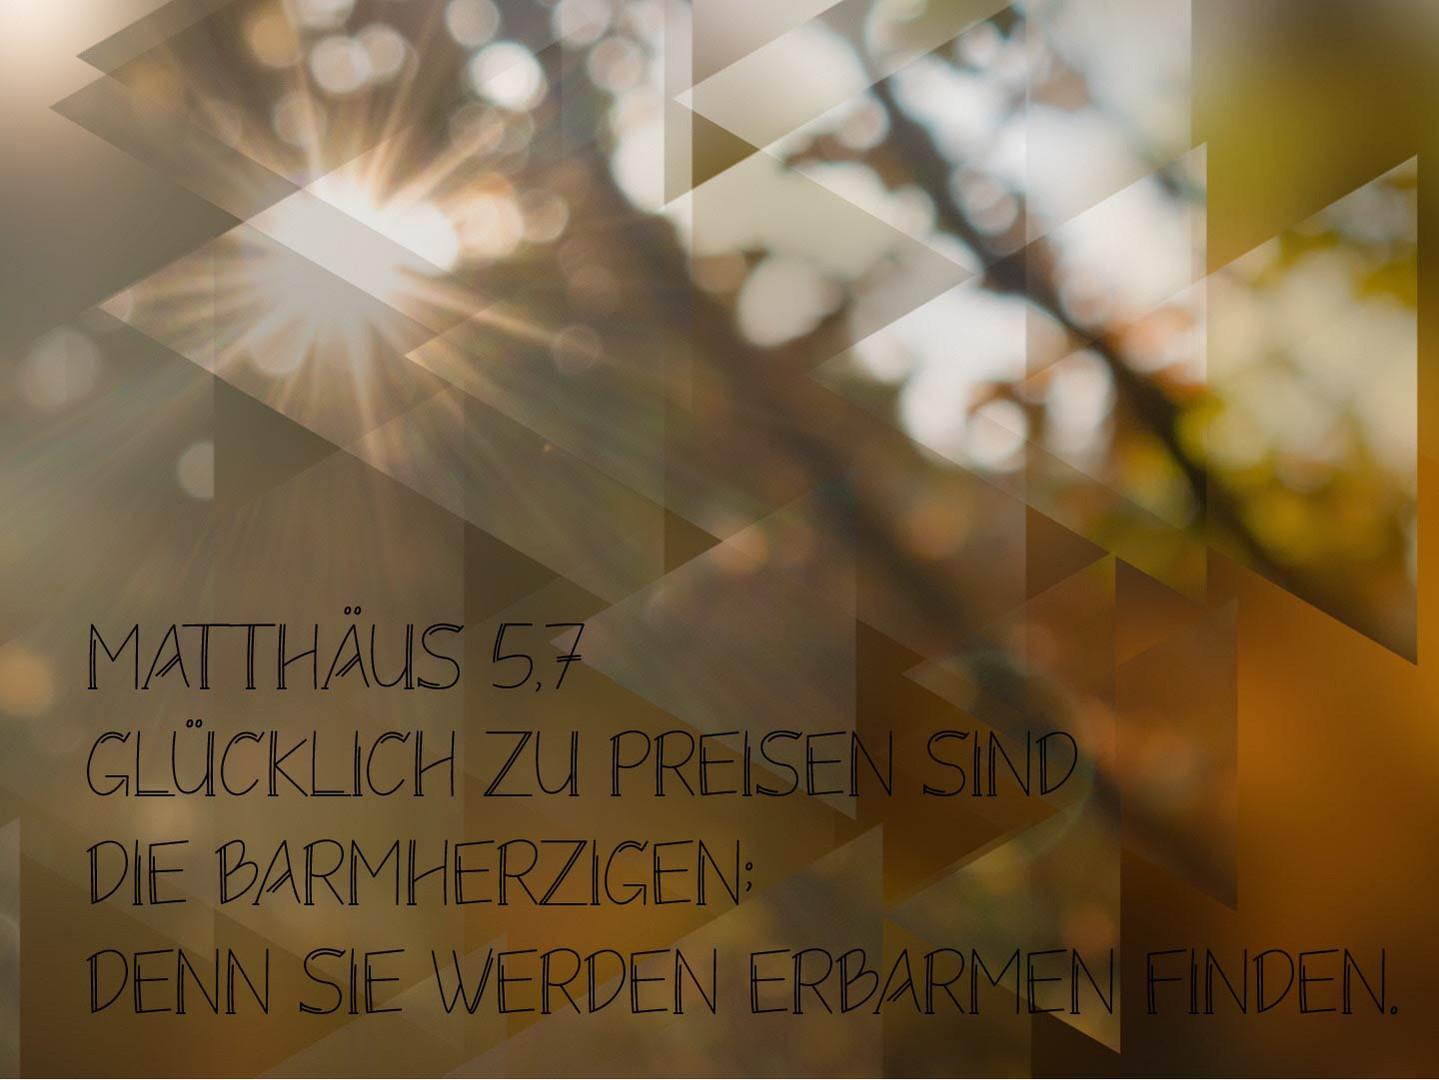 Matthäus 5,7.jpg